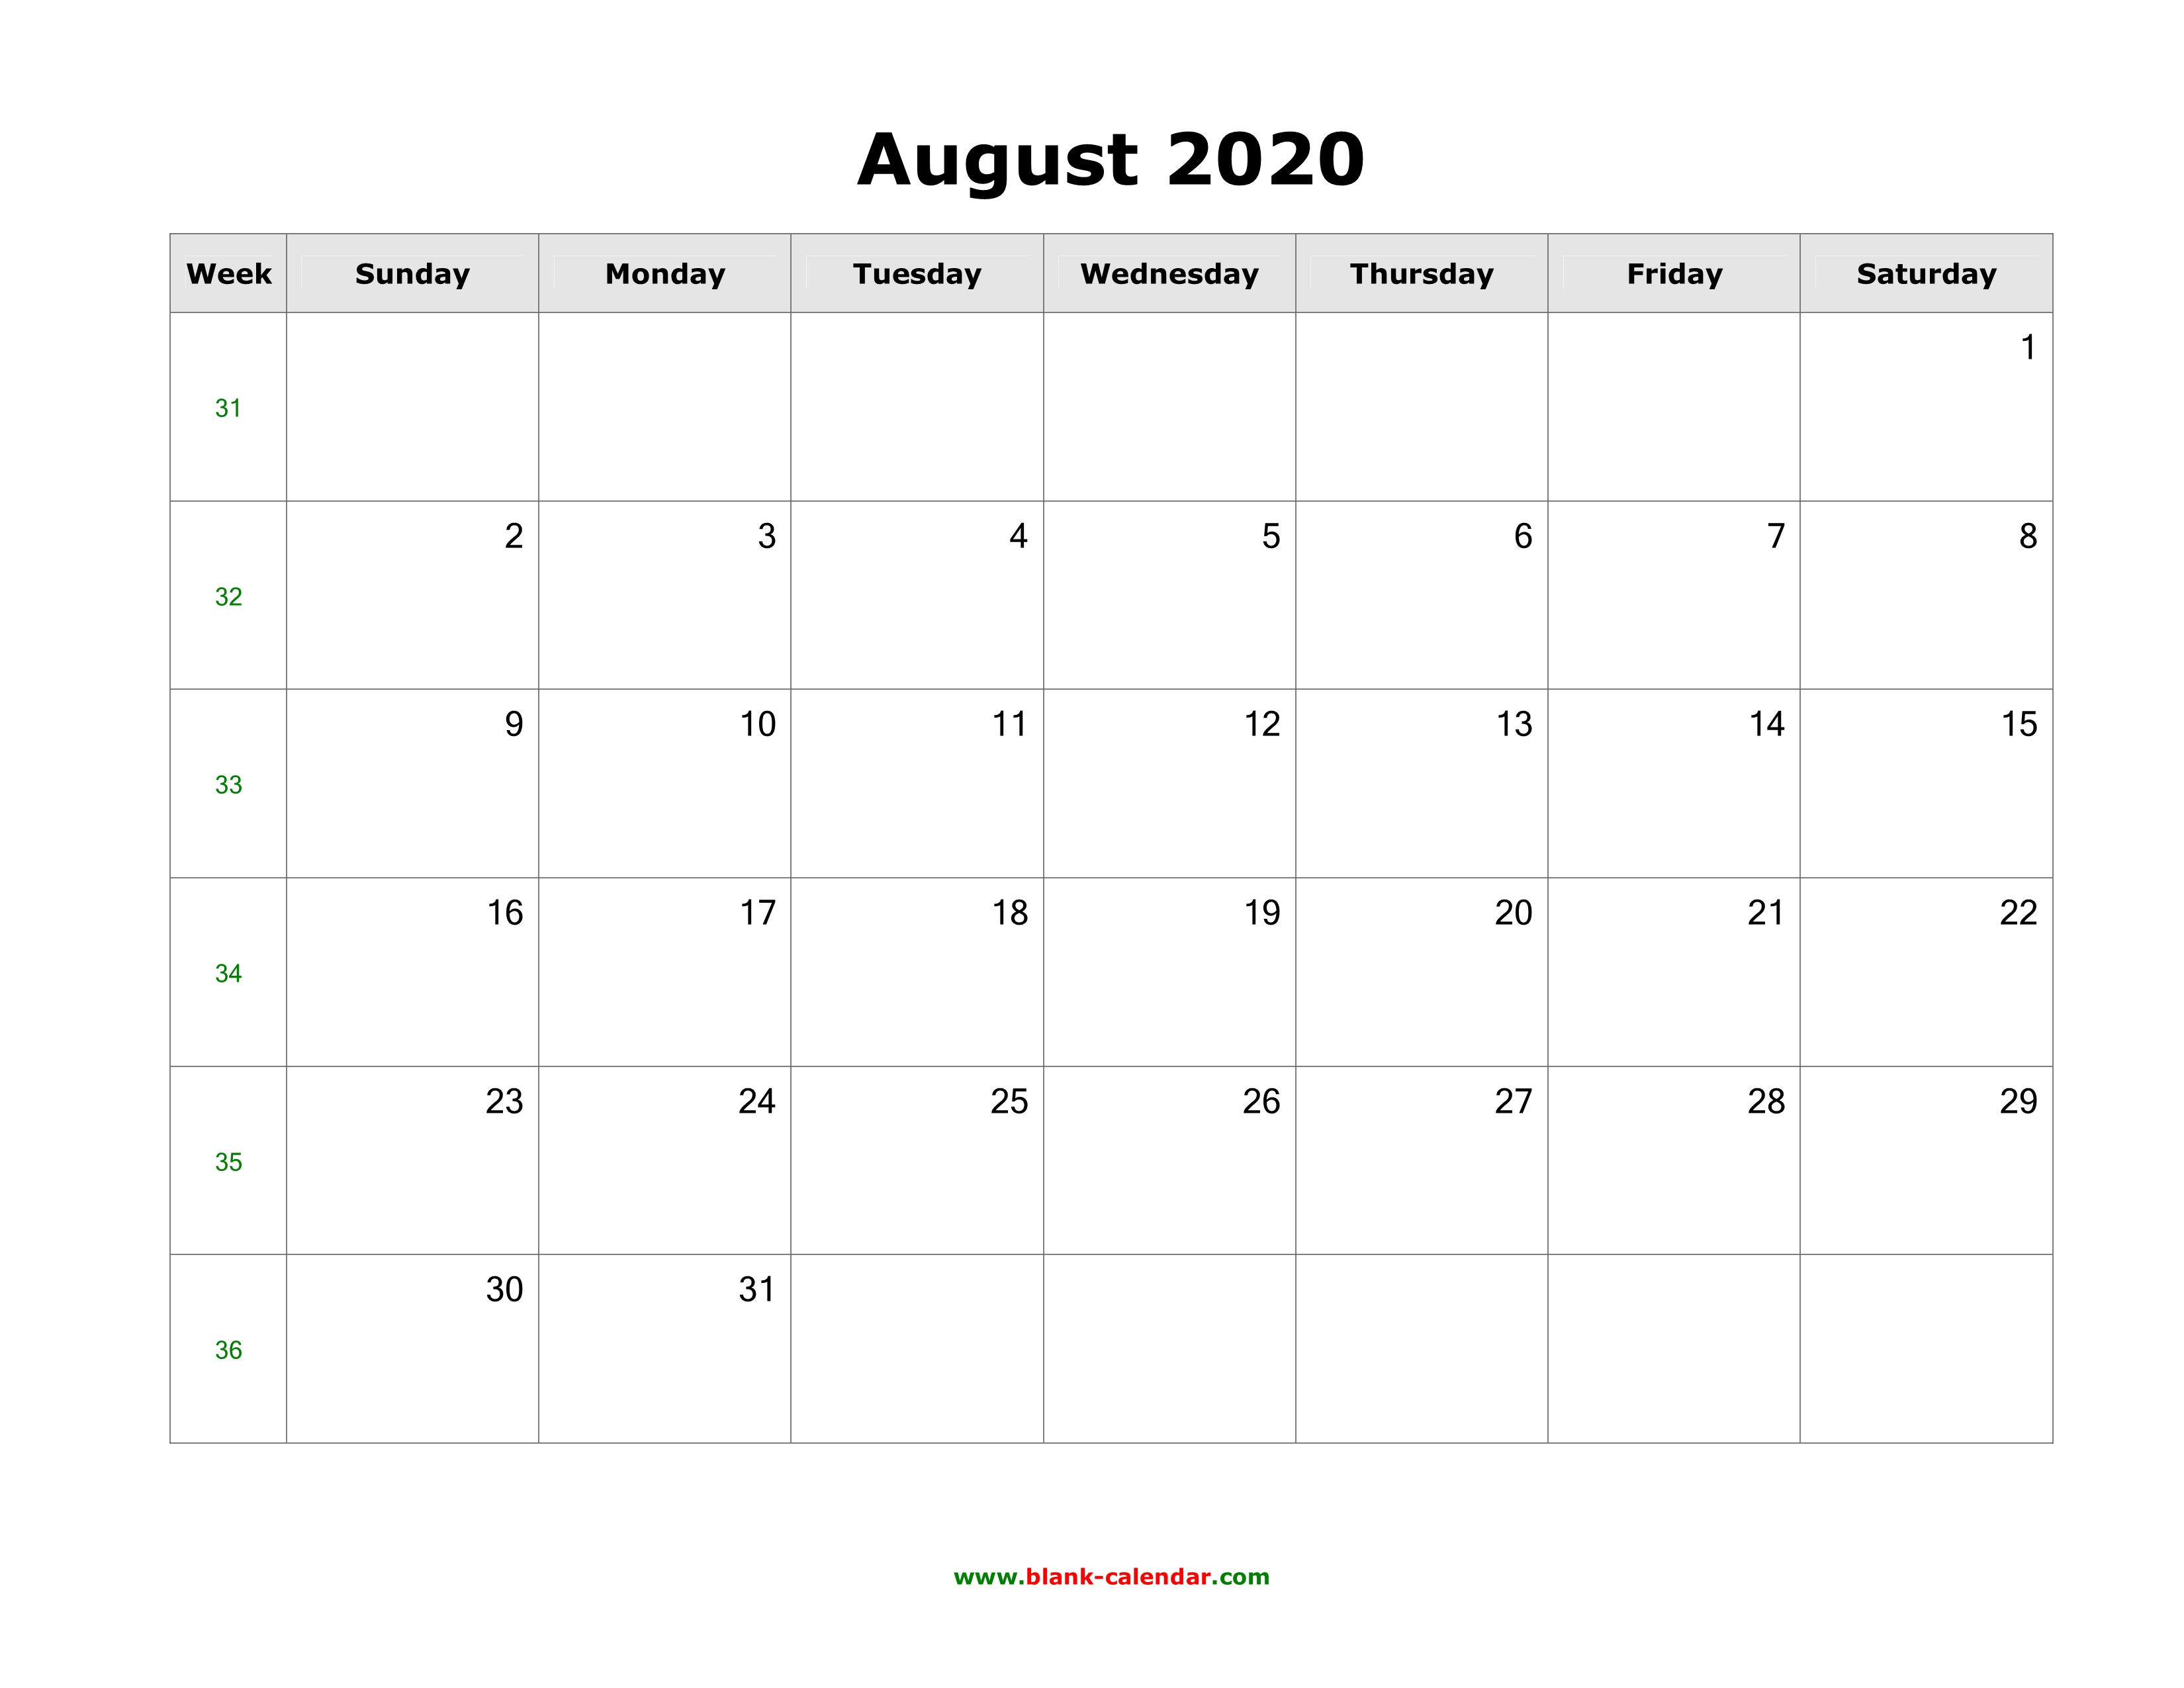 Blank Calendar August 2020.Download August 2020 Blank Calendar With Us Holidays Horizontal